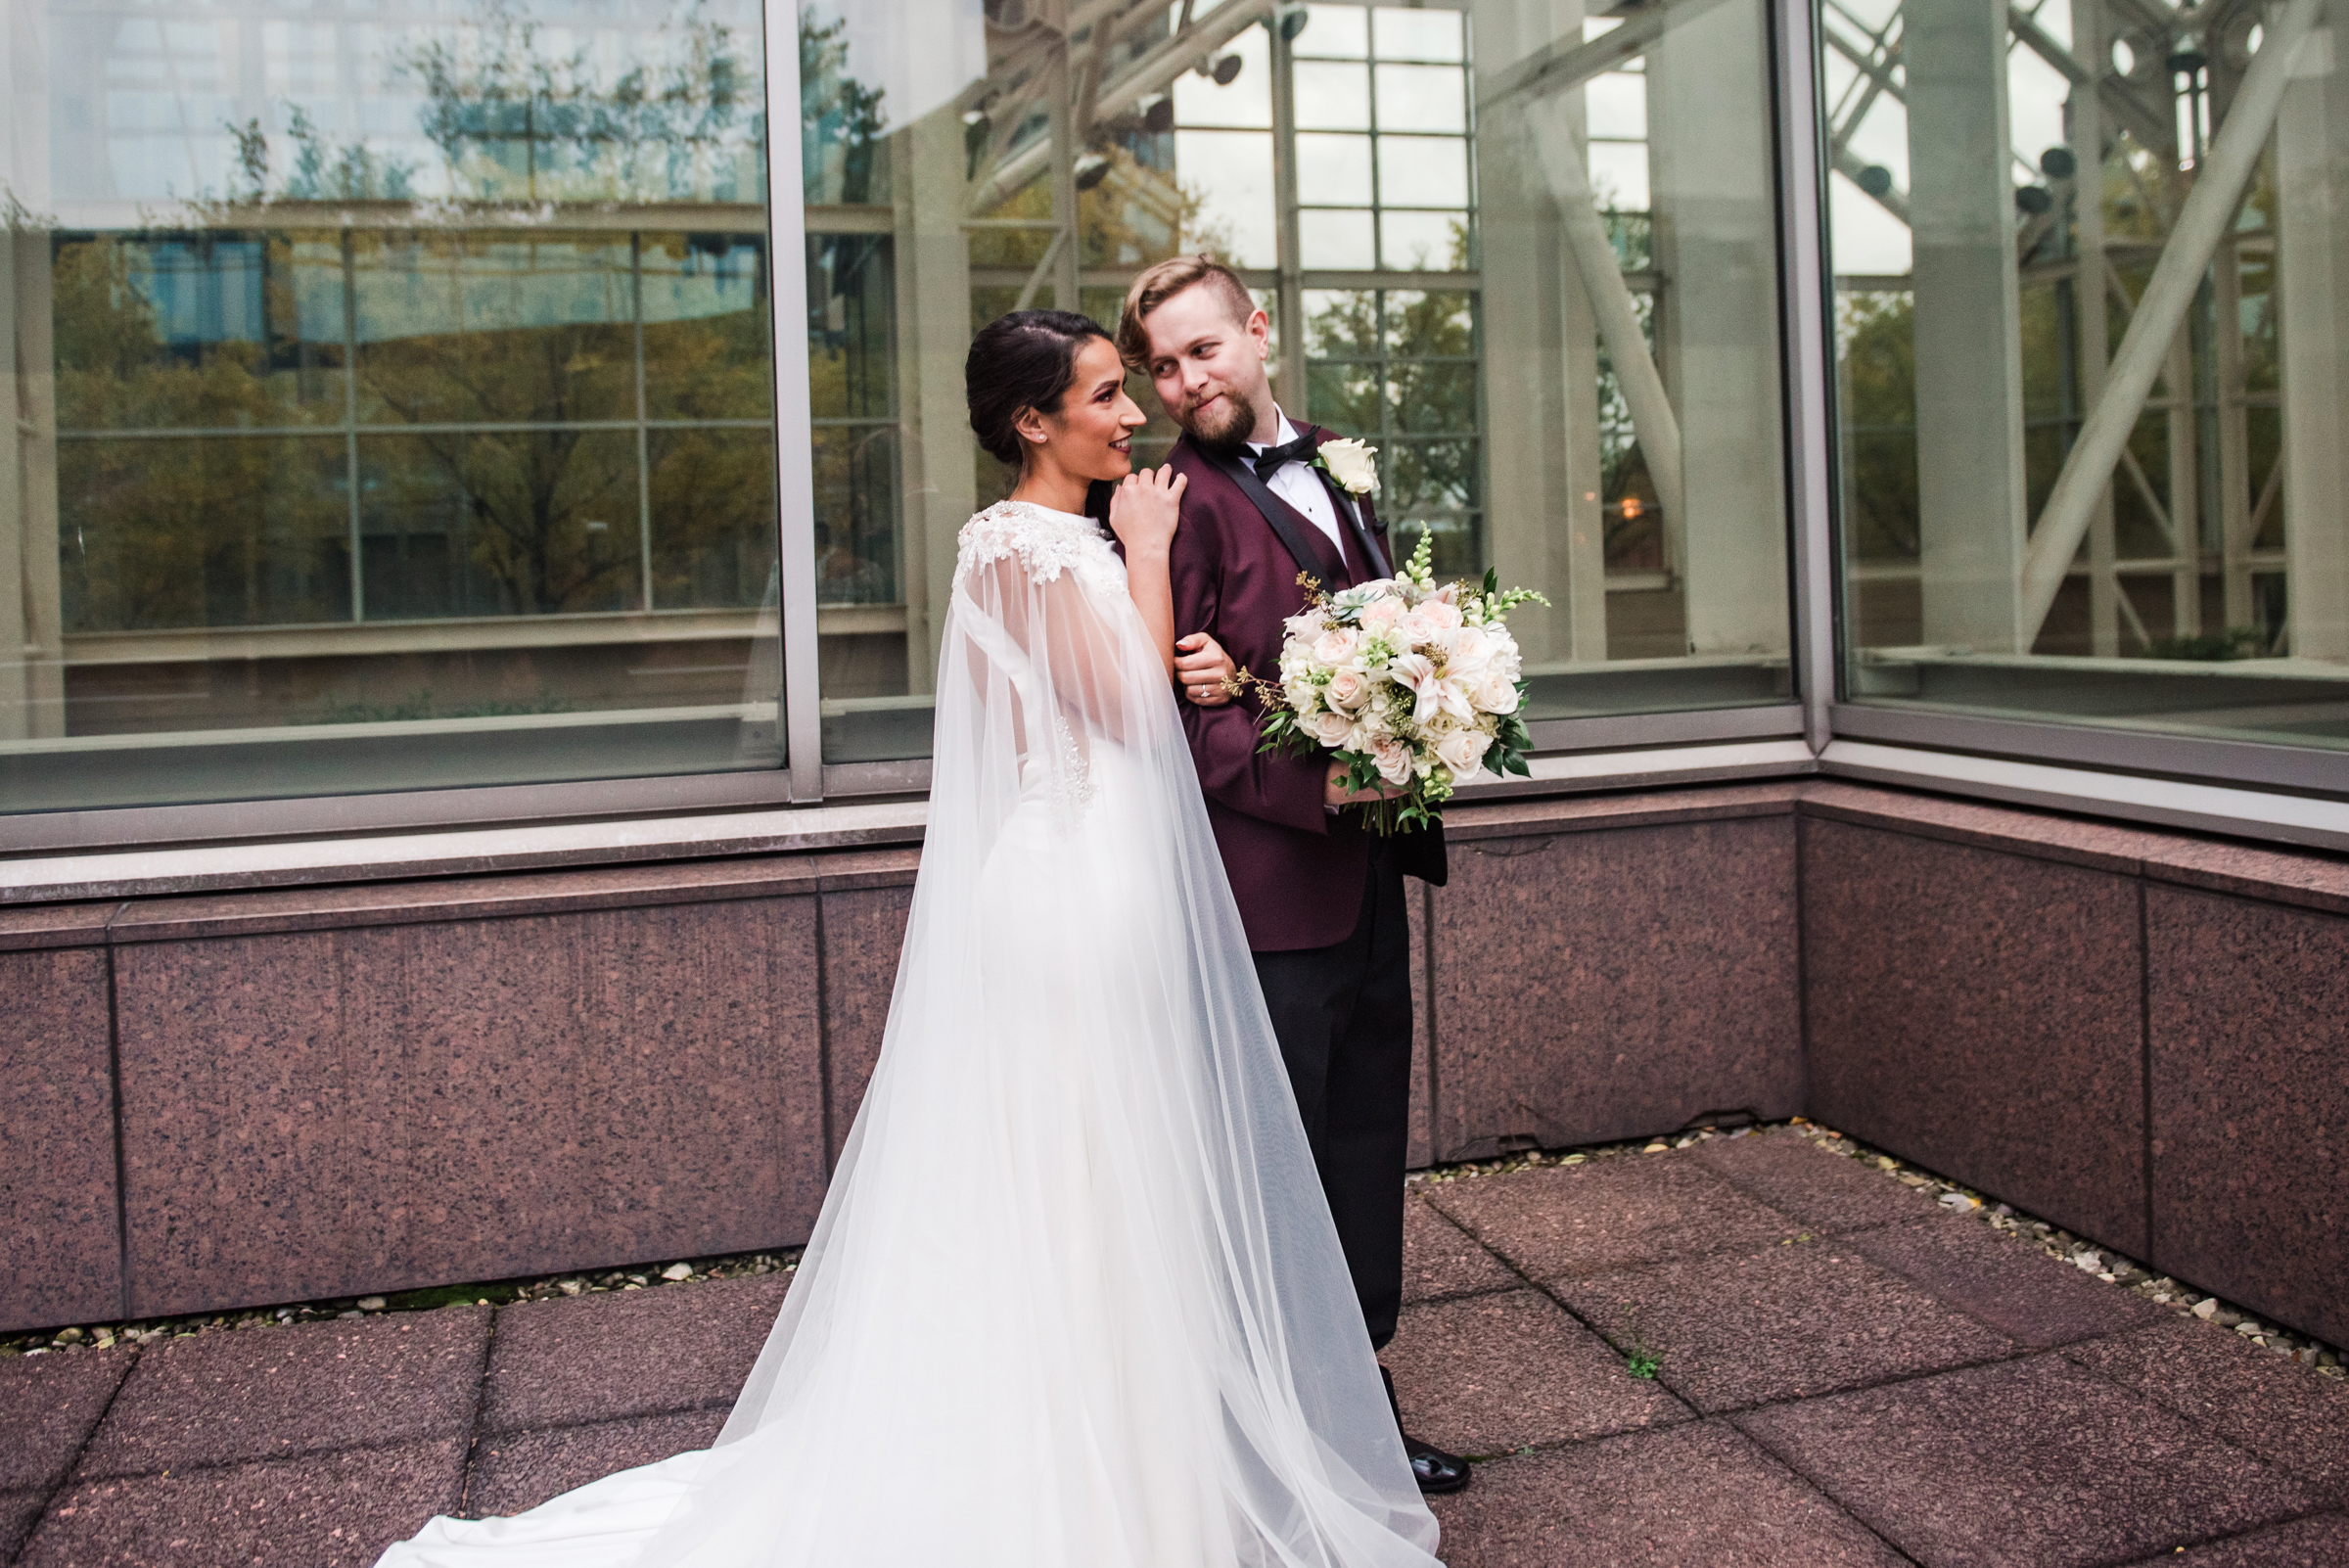 Wintergarden_by_Monroes_Rochester_Wedding_JILL_STUDIO_Rochester_NY_Photographer_174515.jpg